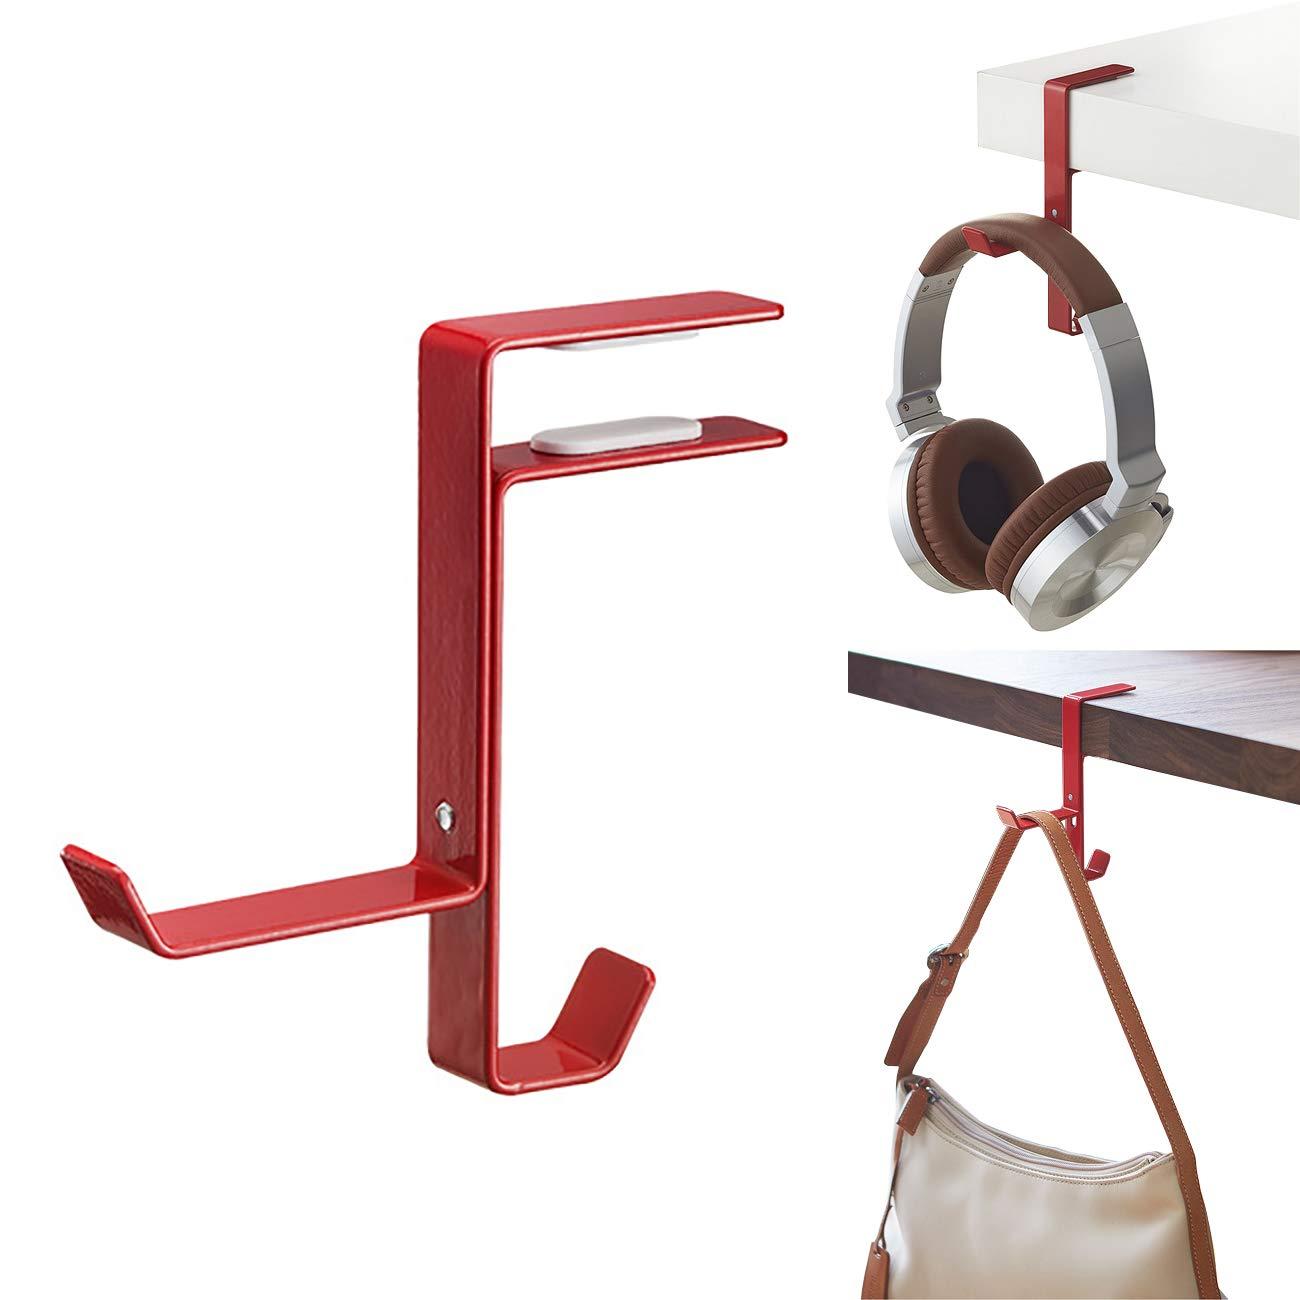 Oriolus メタルヘッドホンハンガー ヘッドセットフックホルダー 調整可能なクランプ付き デスク用 レッド  レッド B07RP76K7N